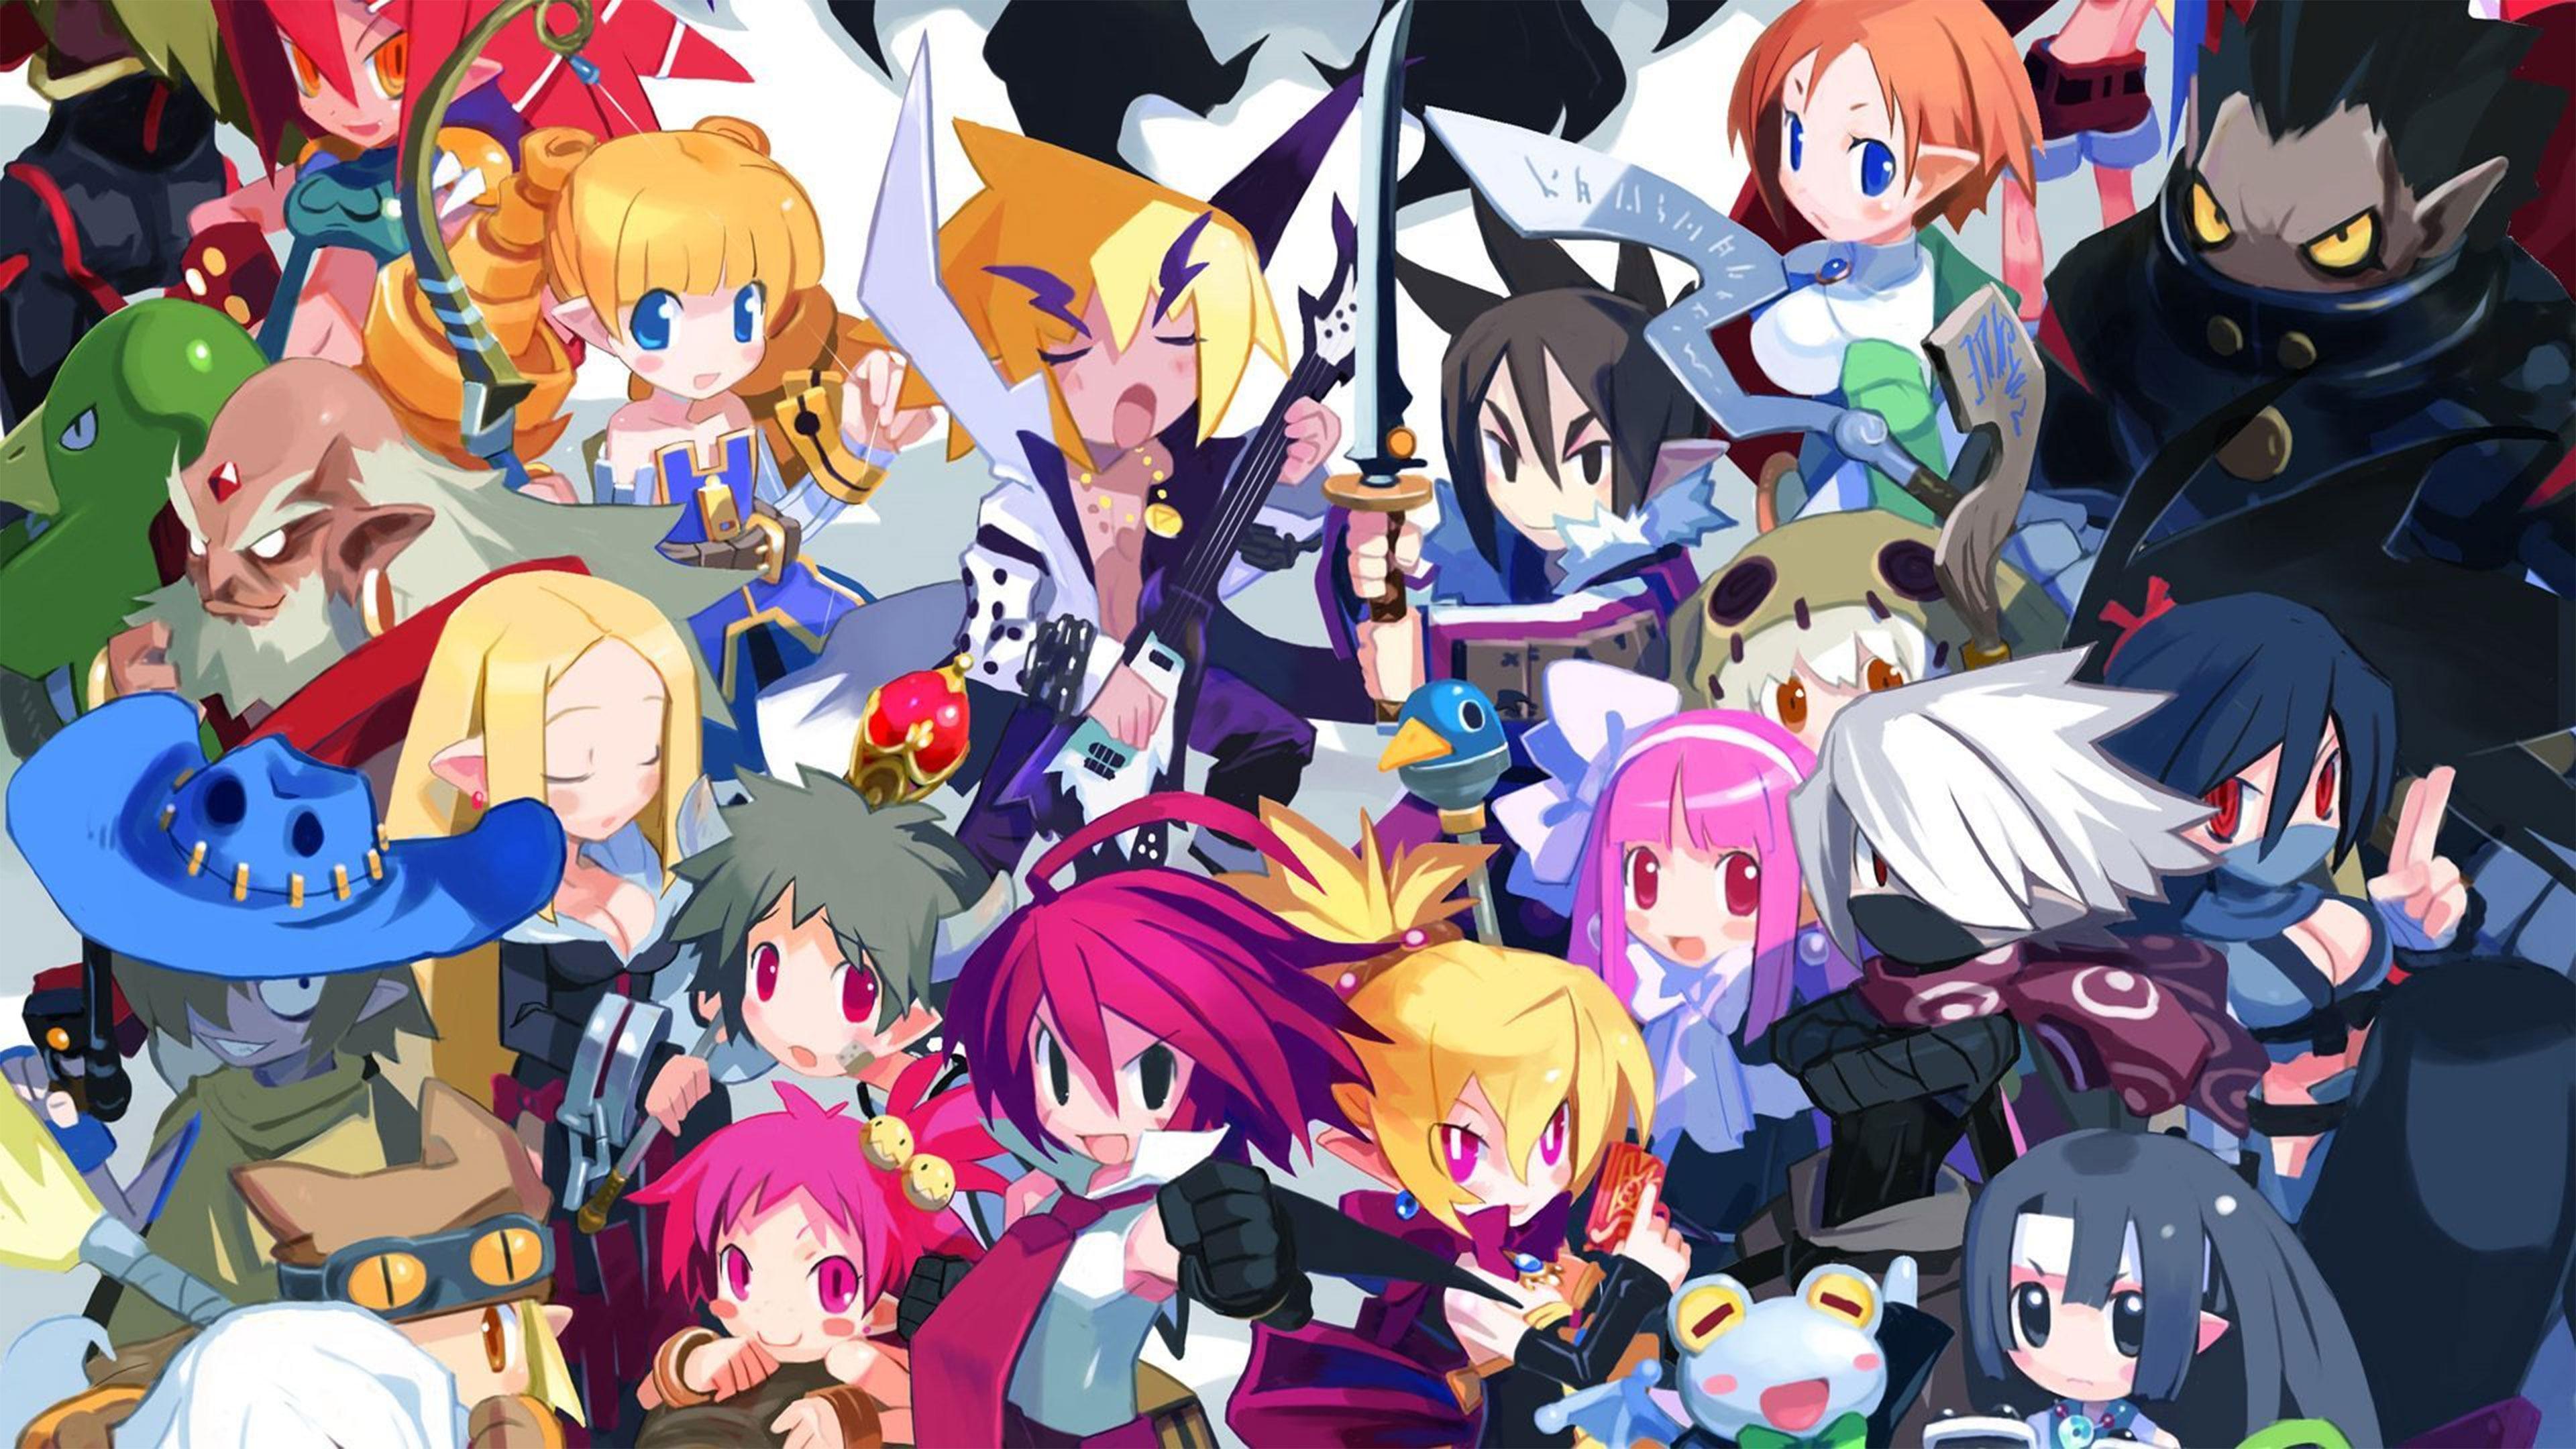 Lewd Anime Girls Wallpaper Disgaea 2 Wallpapers In Ultra Hd 4k